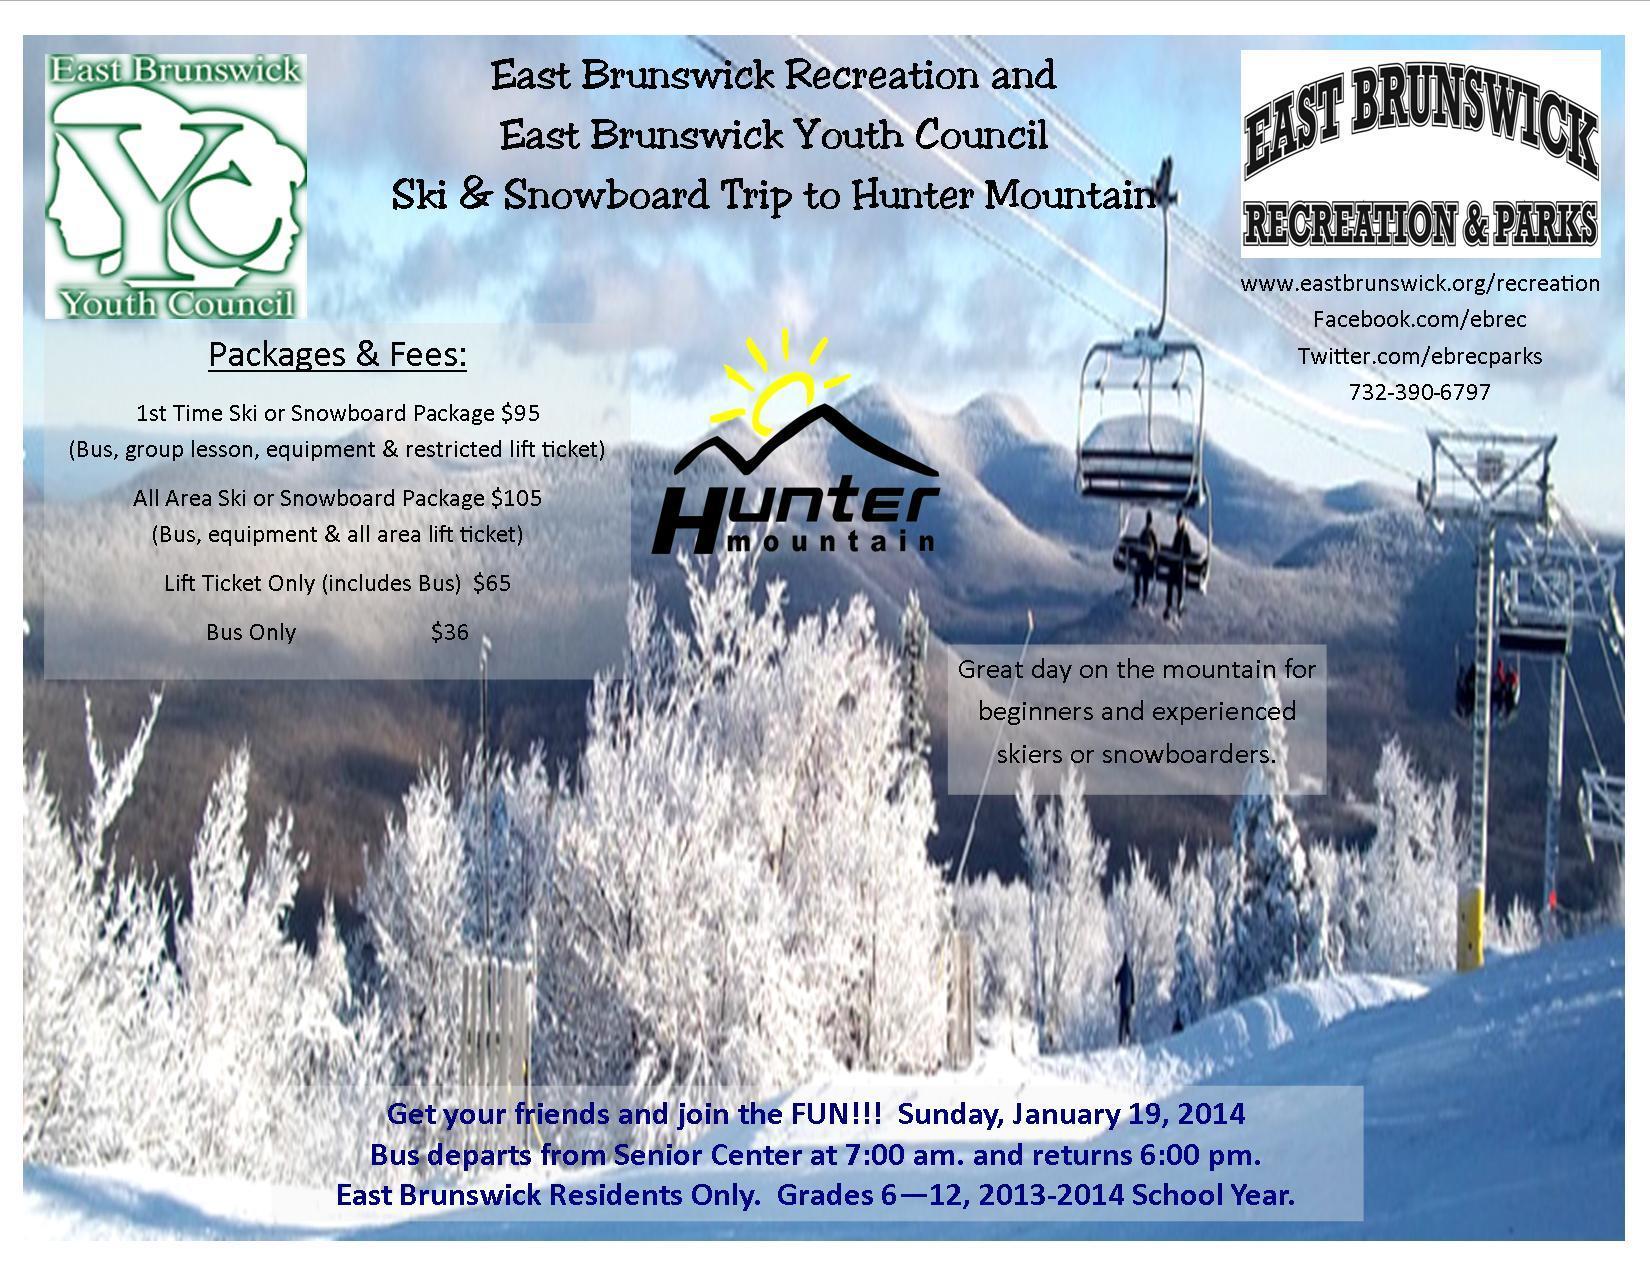 6ae0bf8bbb84ab2dbd26_Hunter_Mountain_Ski_Trip_2014_8x11.jpg